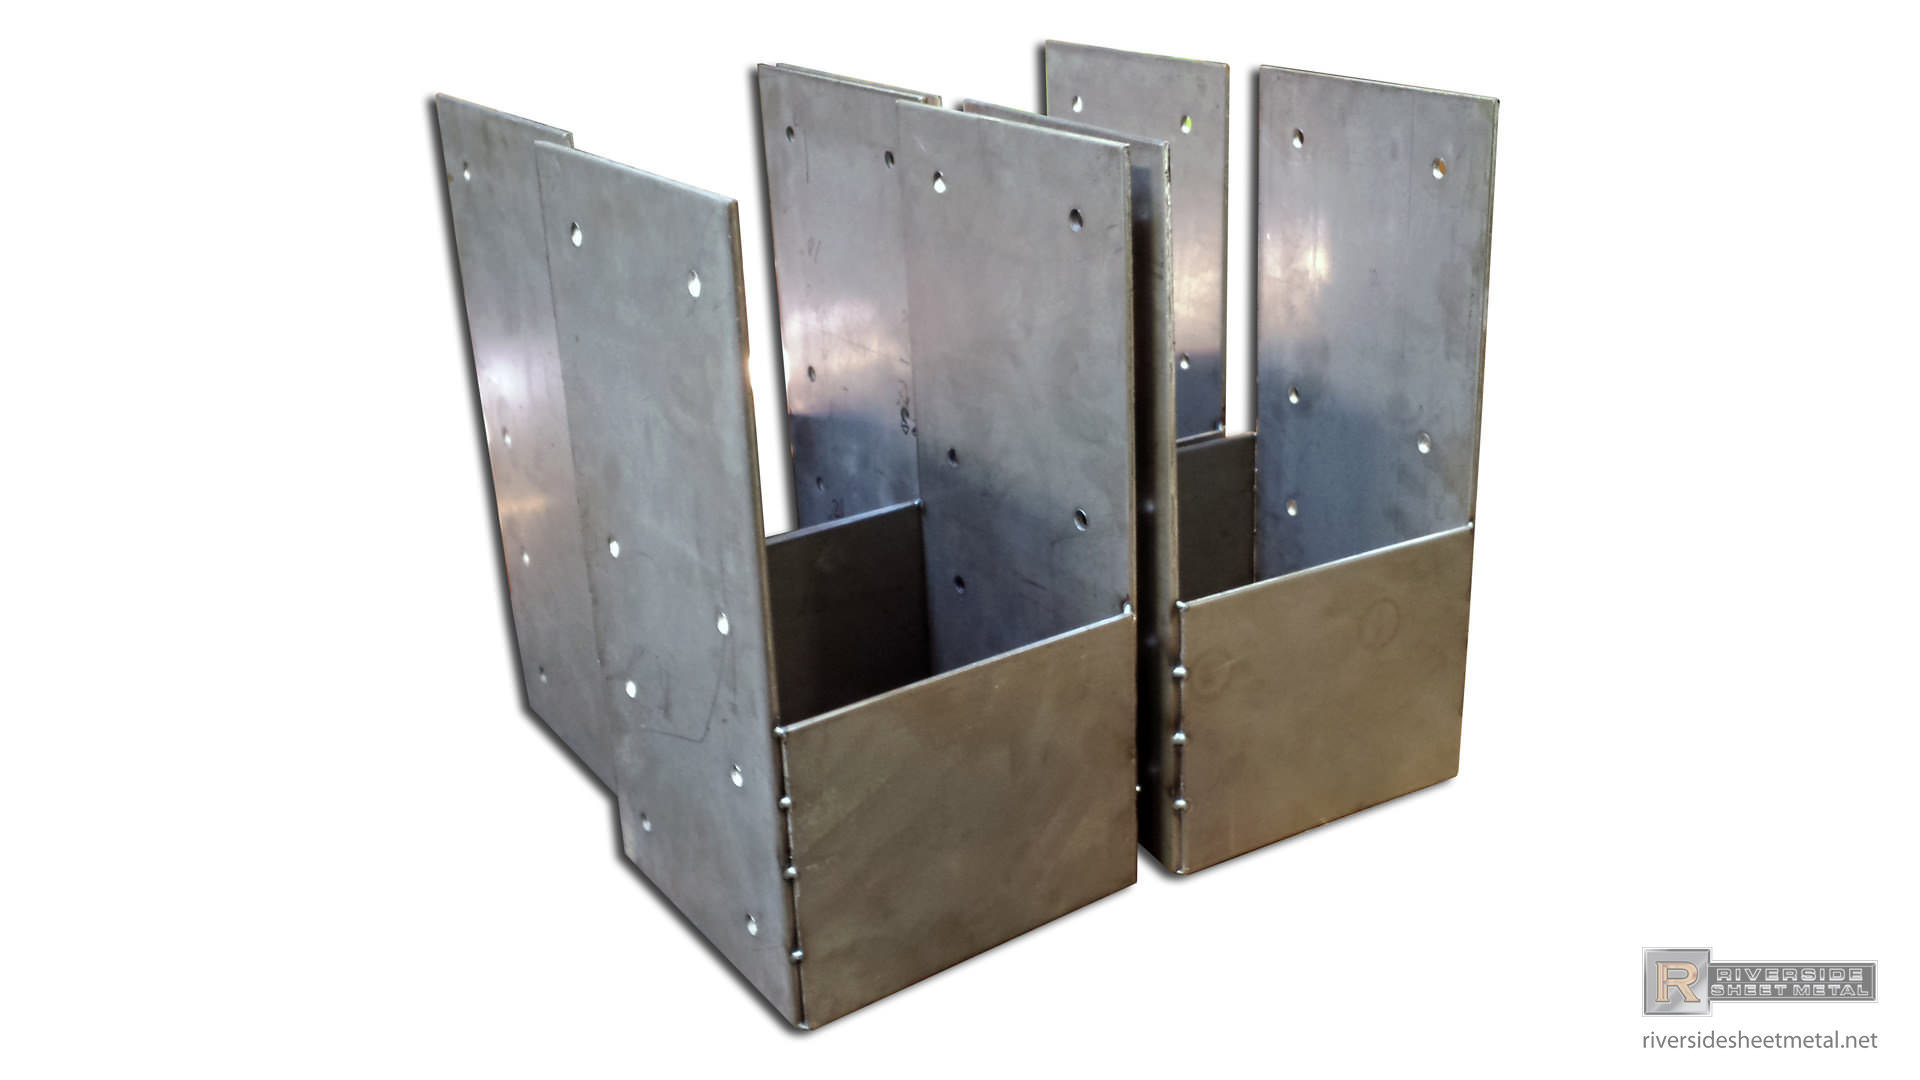 steel bracket for wooden beams massachusetts sheet metal. Black Bedroom Furniture Sets. Home Design Ideas